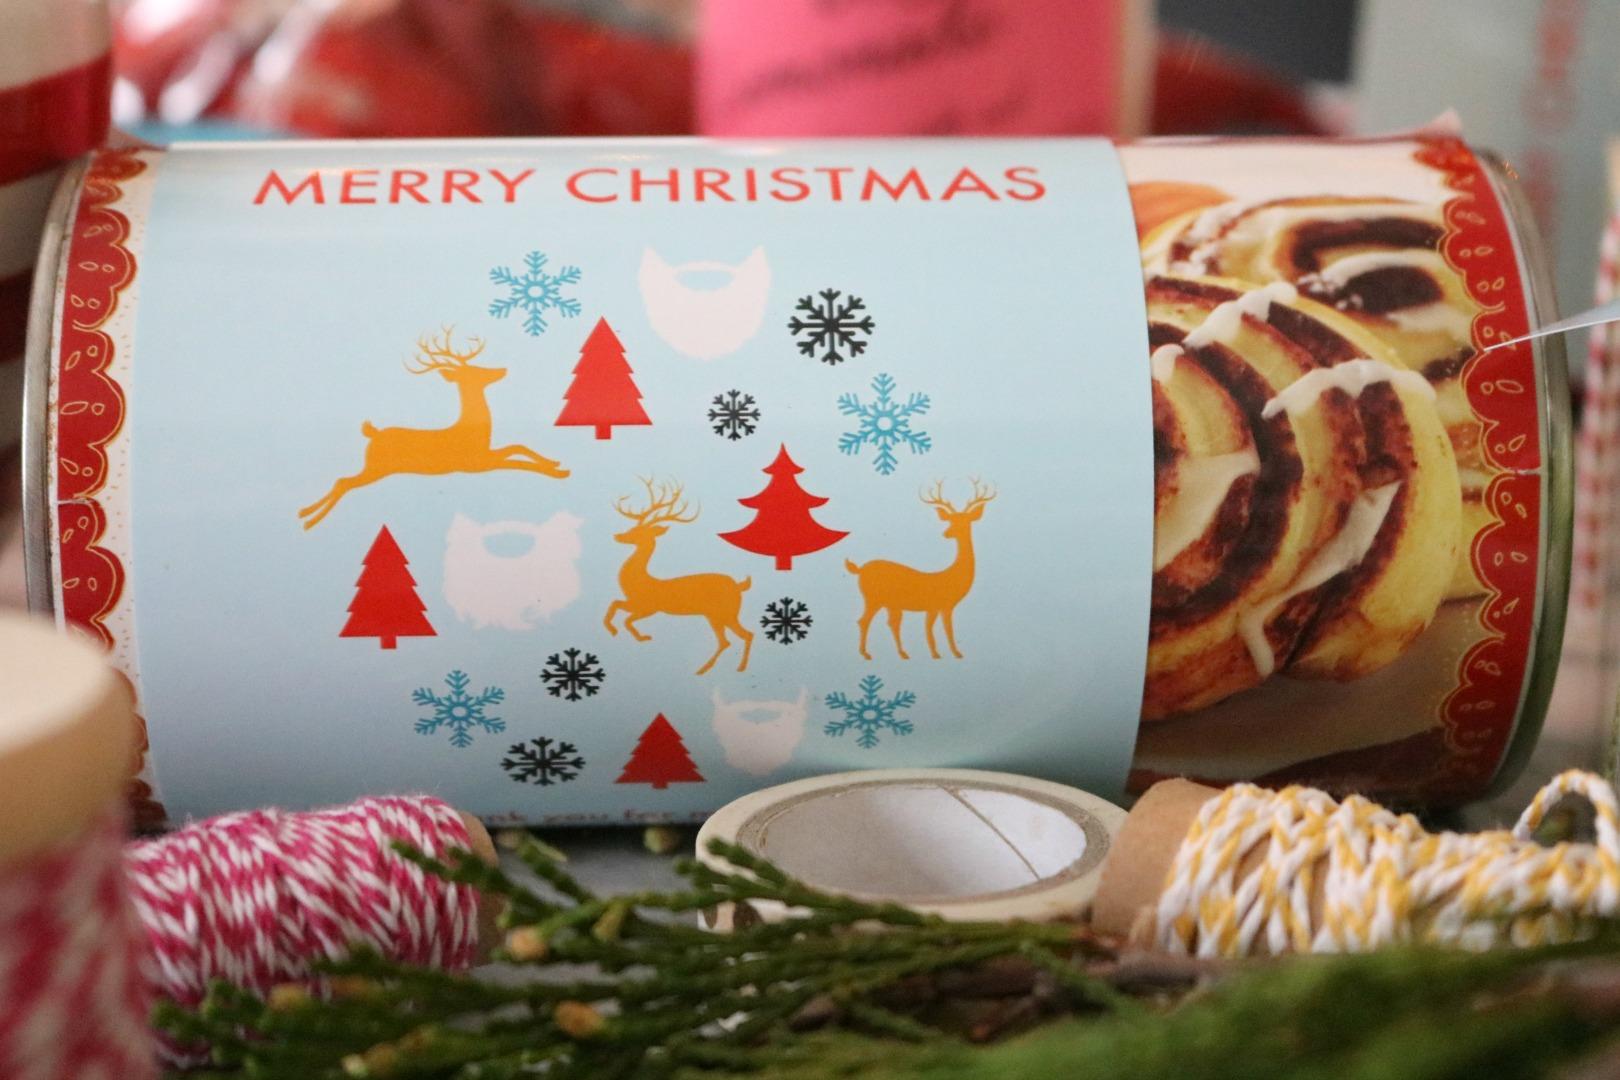 Neighbor Gift Ideas- Unique ways to Spread Joy